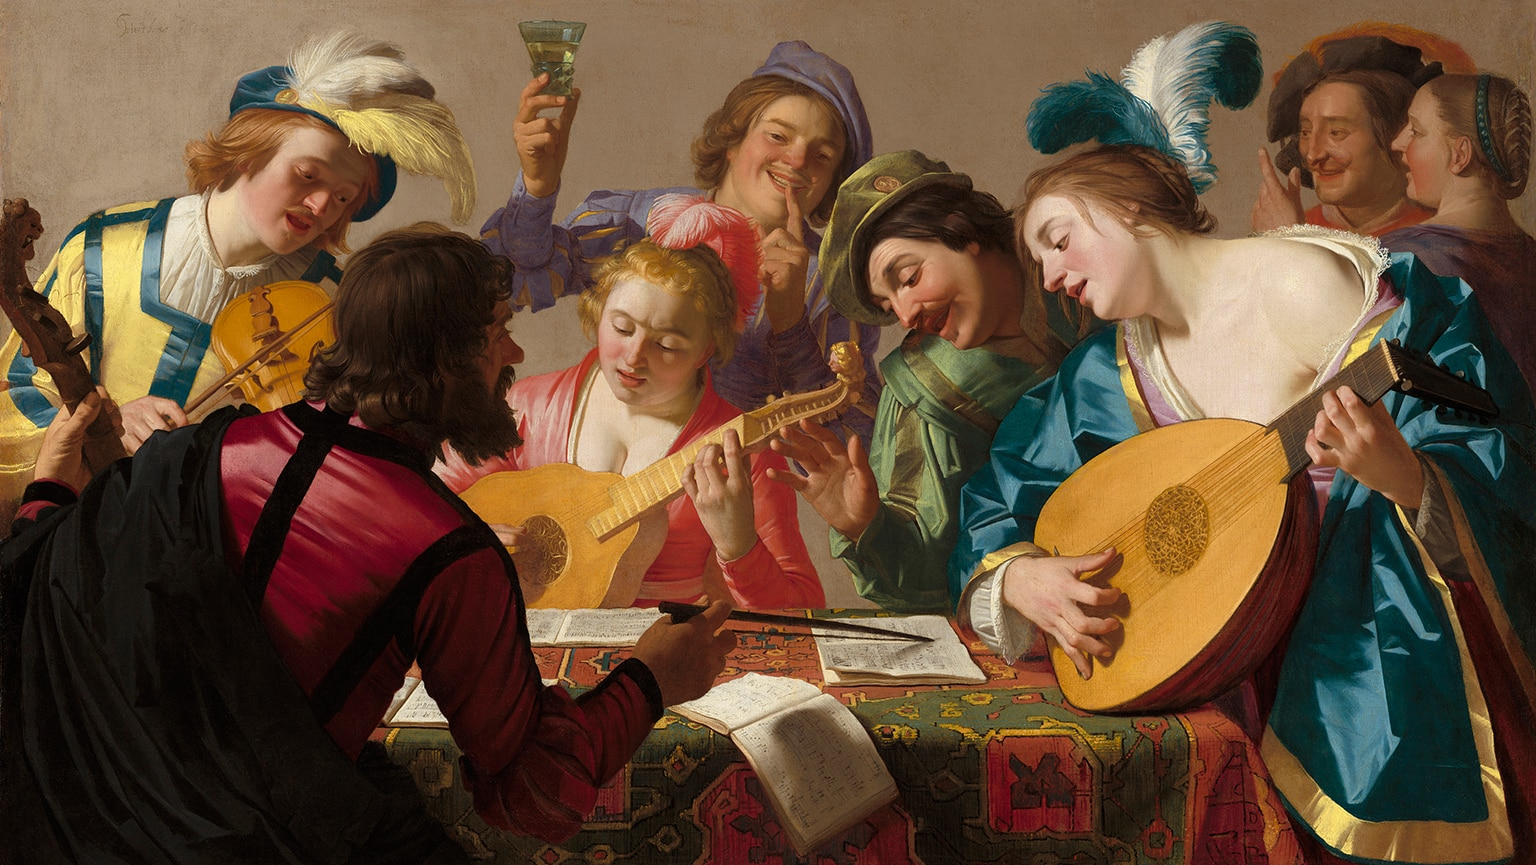 Invention of Opera and Monteverdi's Orfeo, II